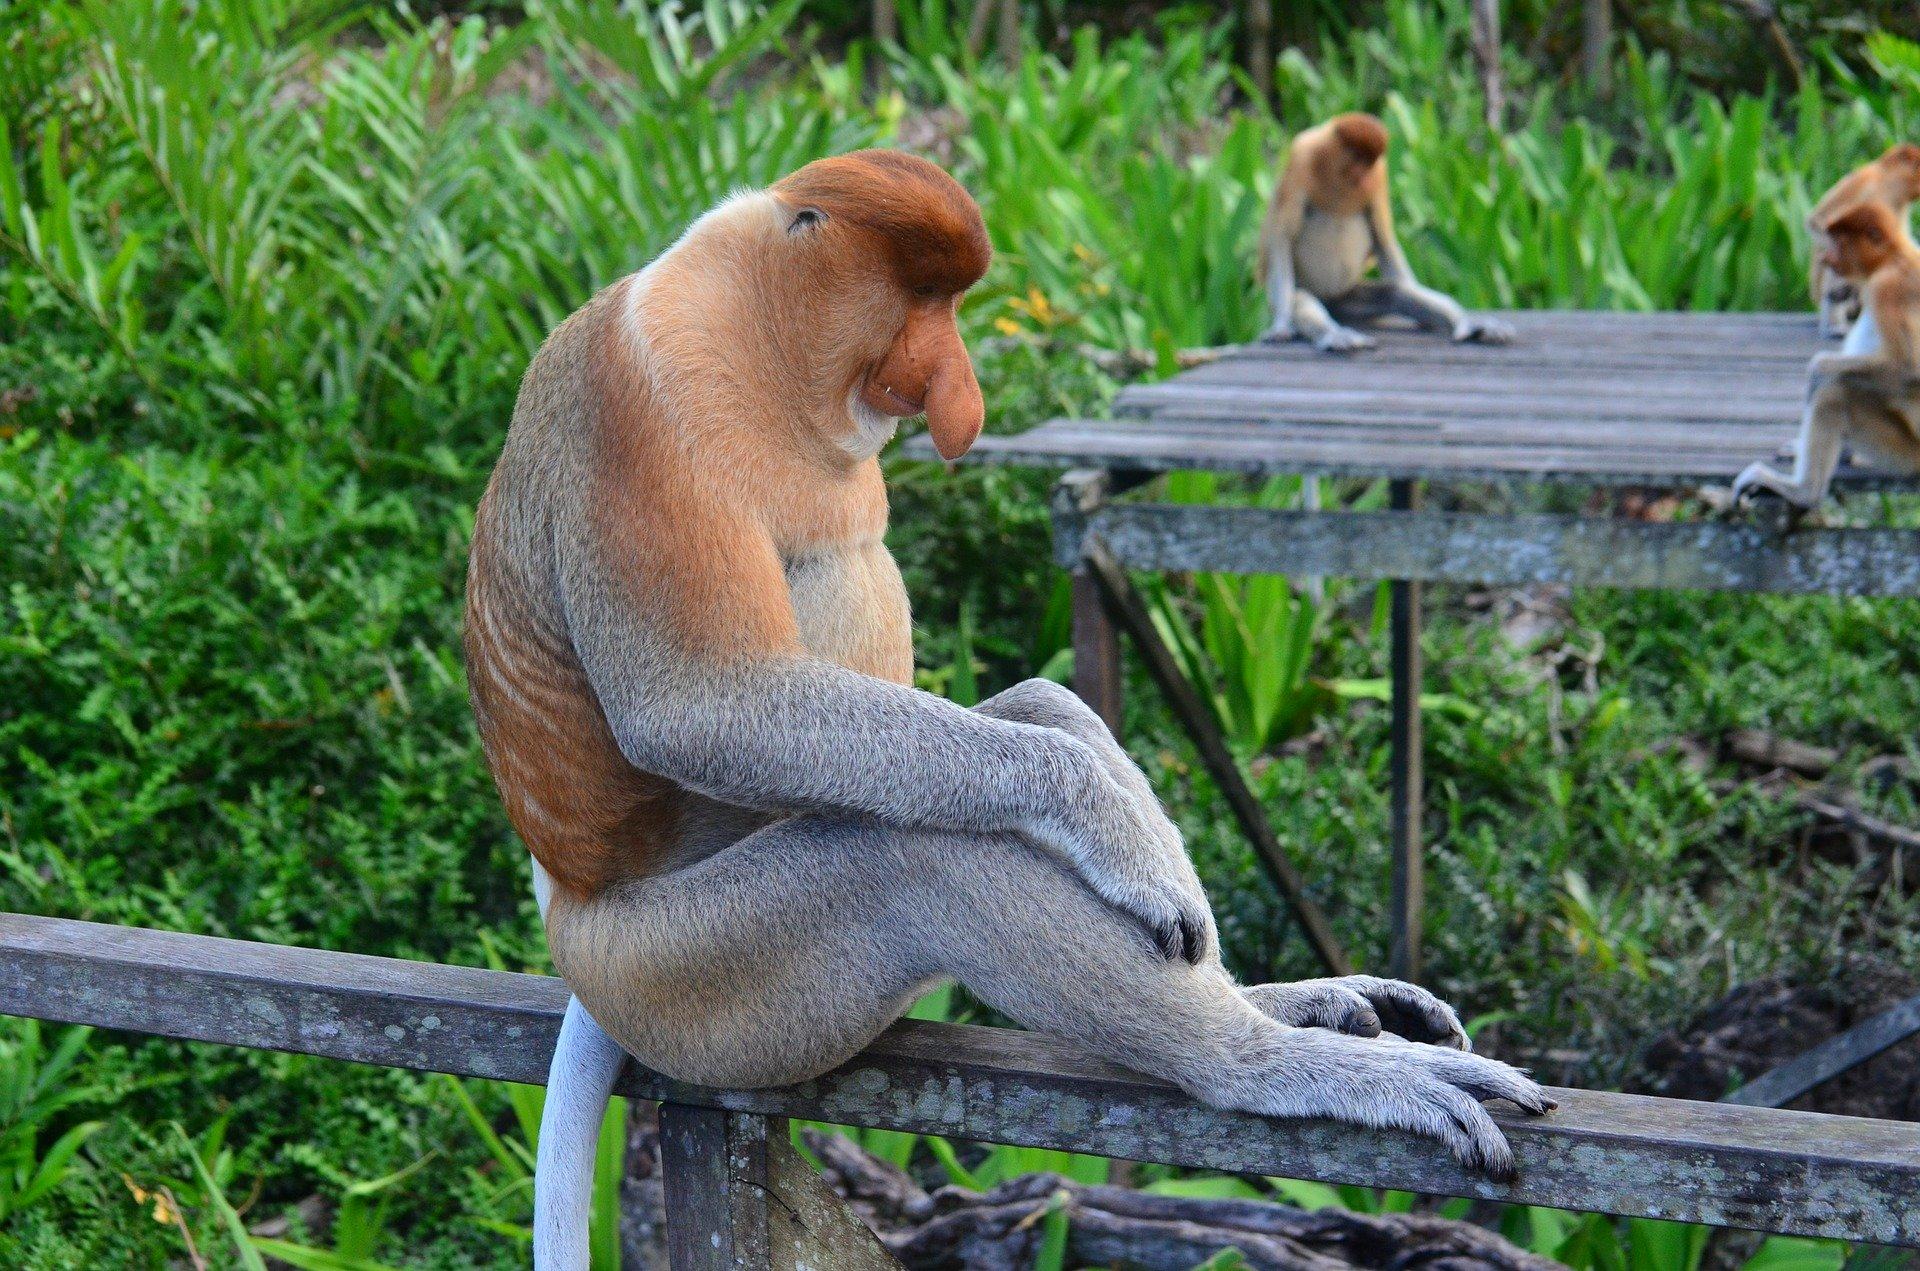 Protecting proboscis monkeys from deforestation